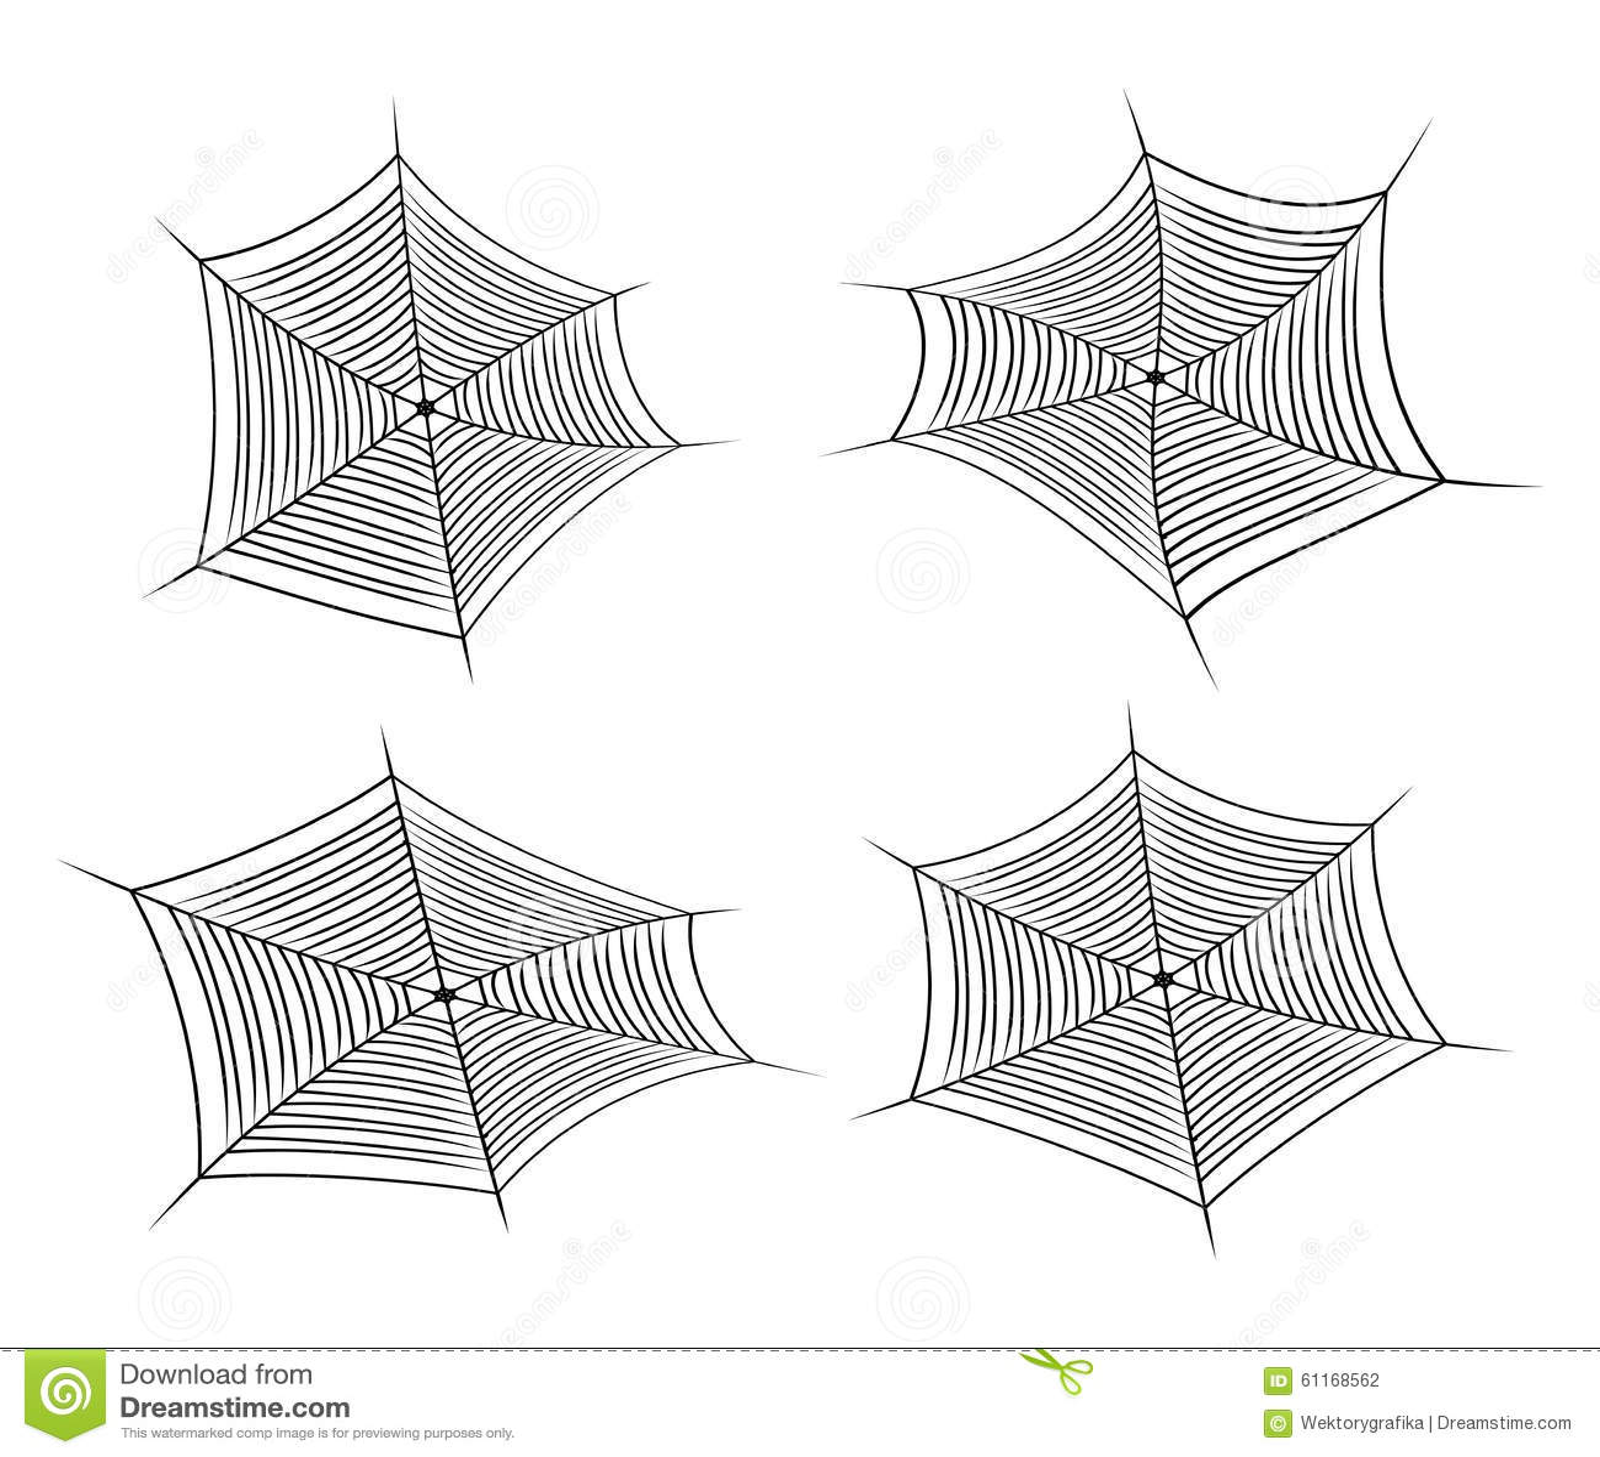 halloween spider web, cobweb symbol, icon set. vector illustration